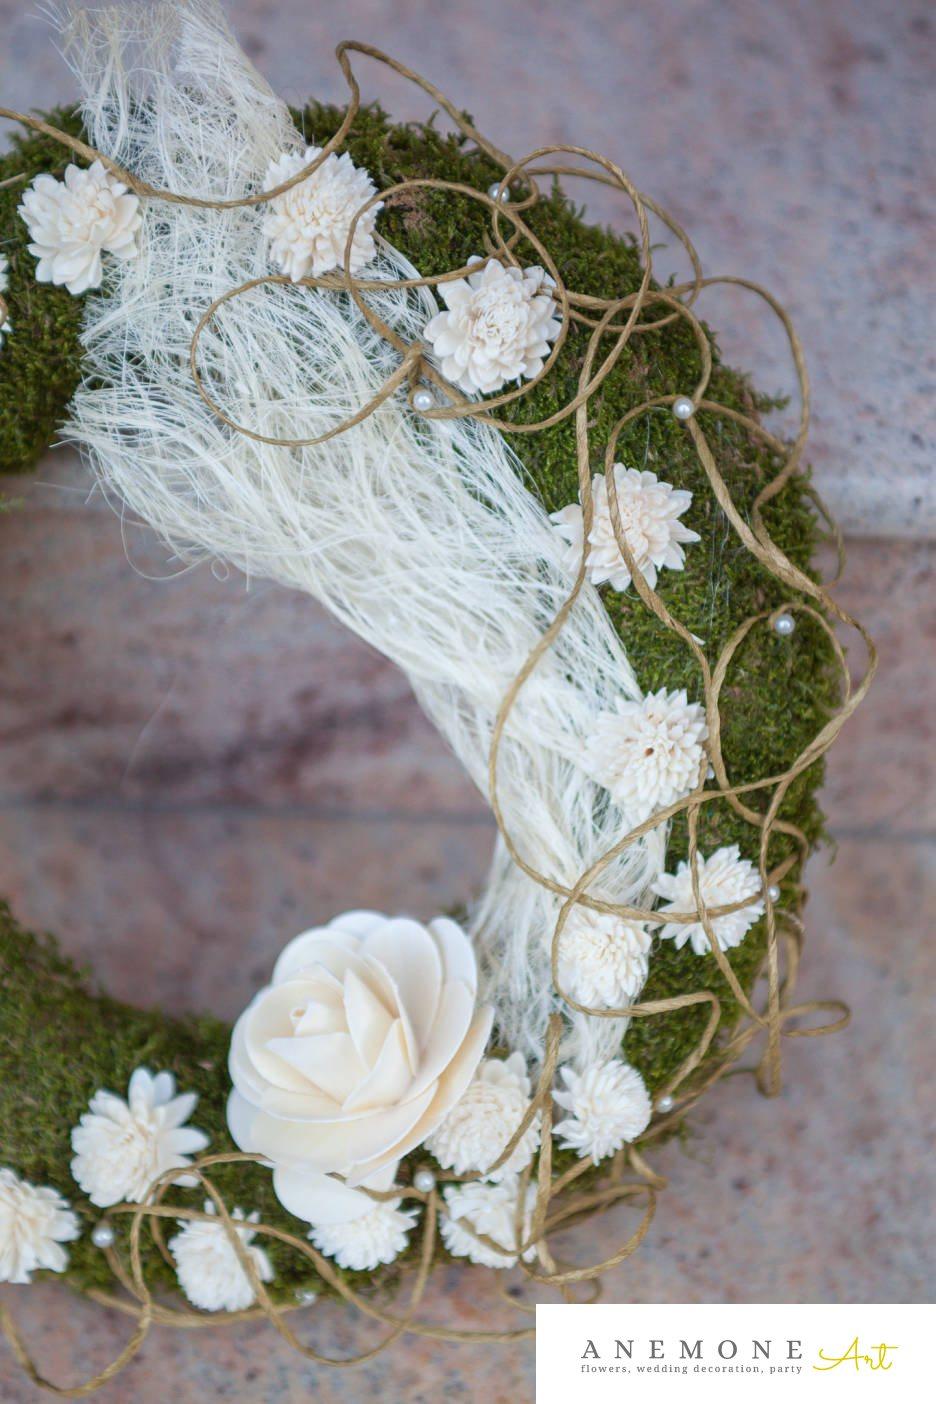 Poza, foto cu Flori de nunta alb, coroana funerara, muschi, perle, trandafiri in Arad, Timisoara, Oradea (wedding flowers, bouquets) nunta Arad, Timisoara, Oradea